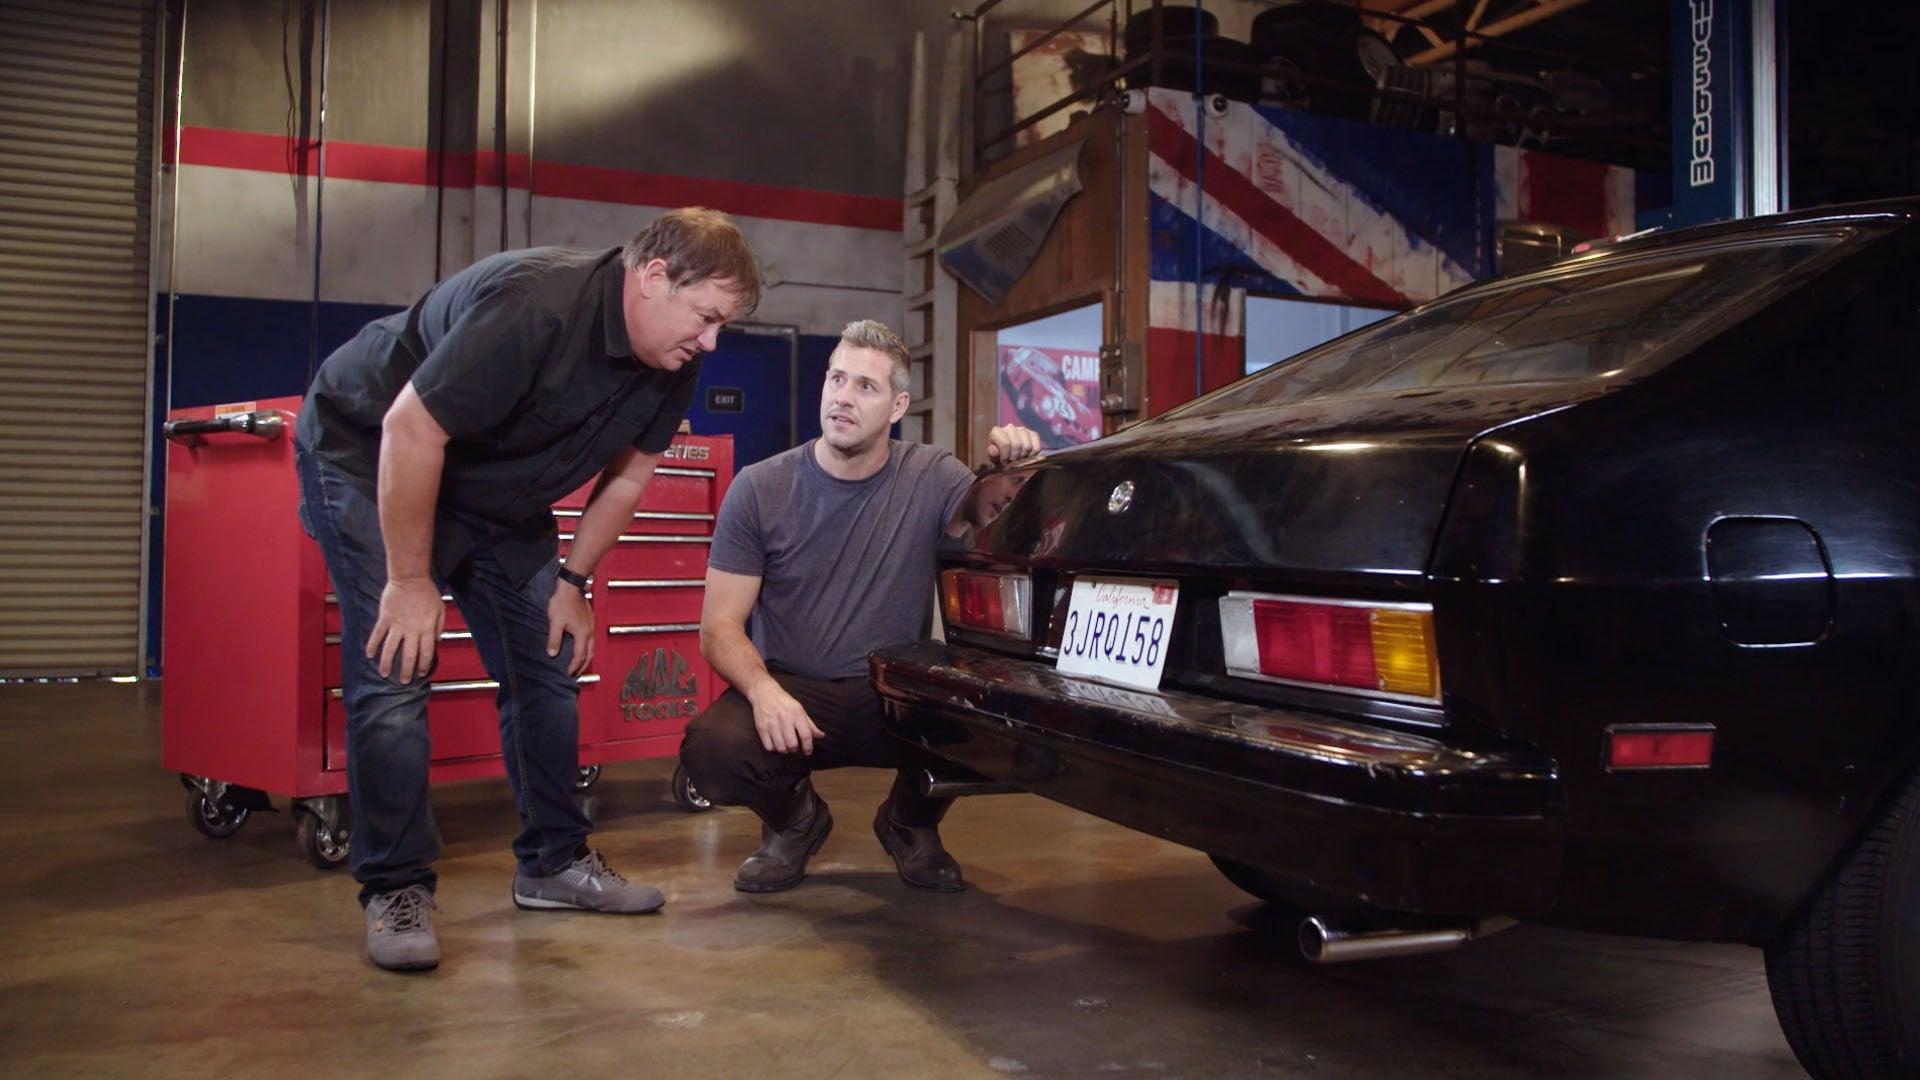 720p~ Wheeler Dealers Season 22 Episode 2